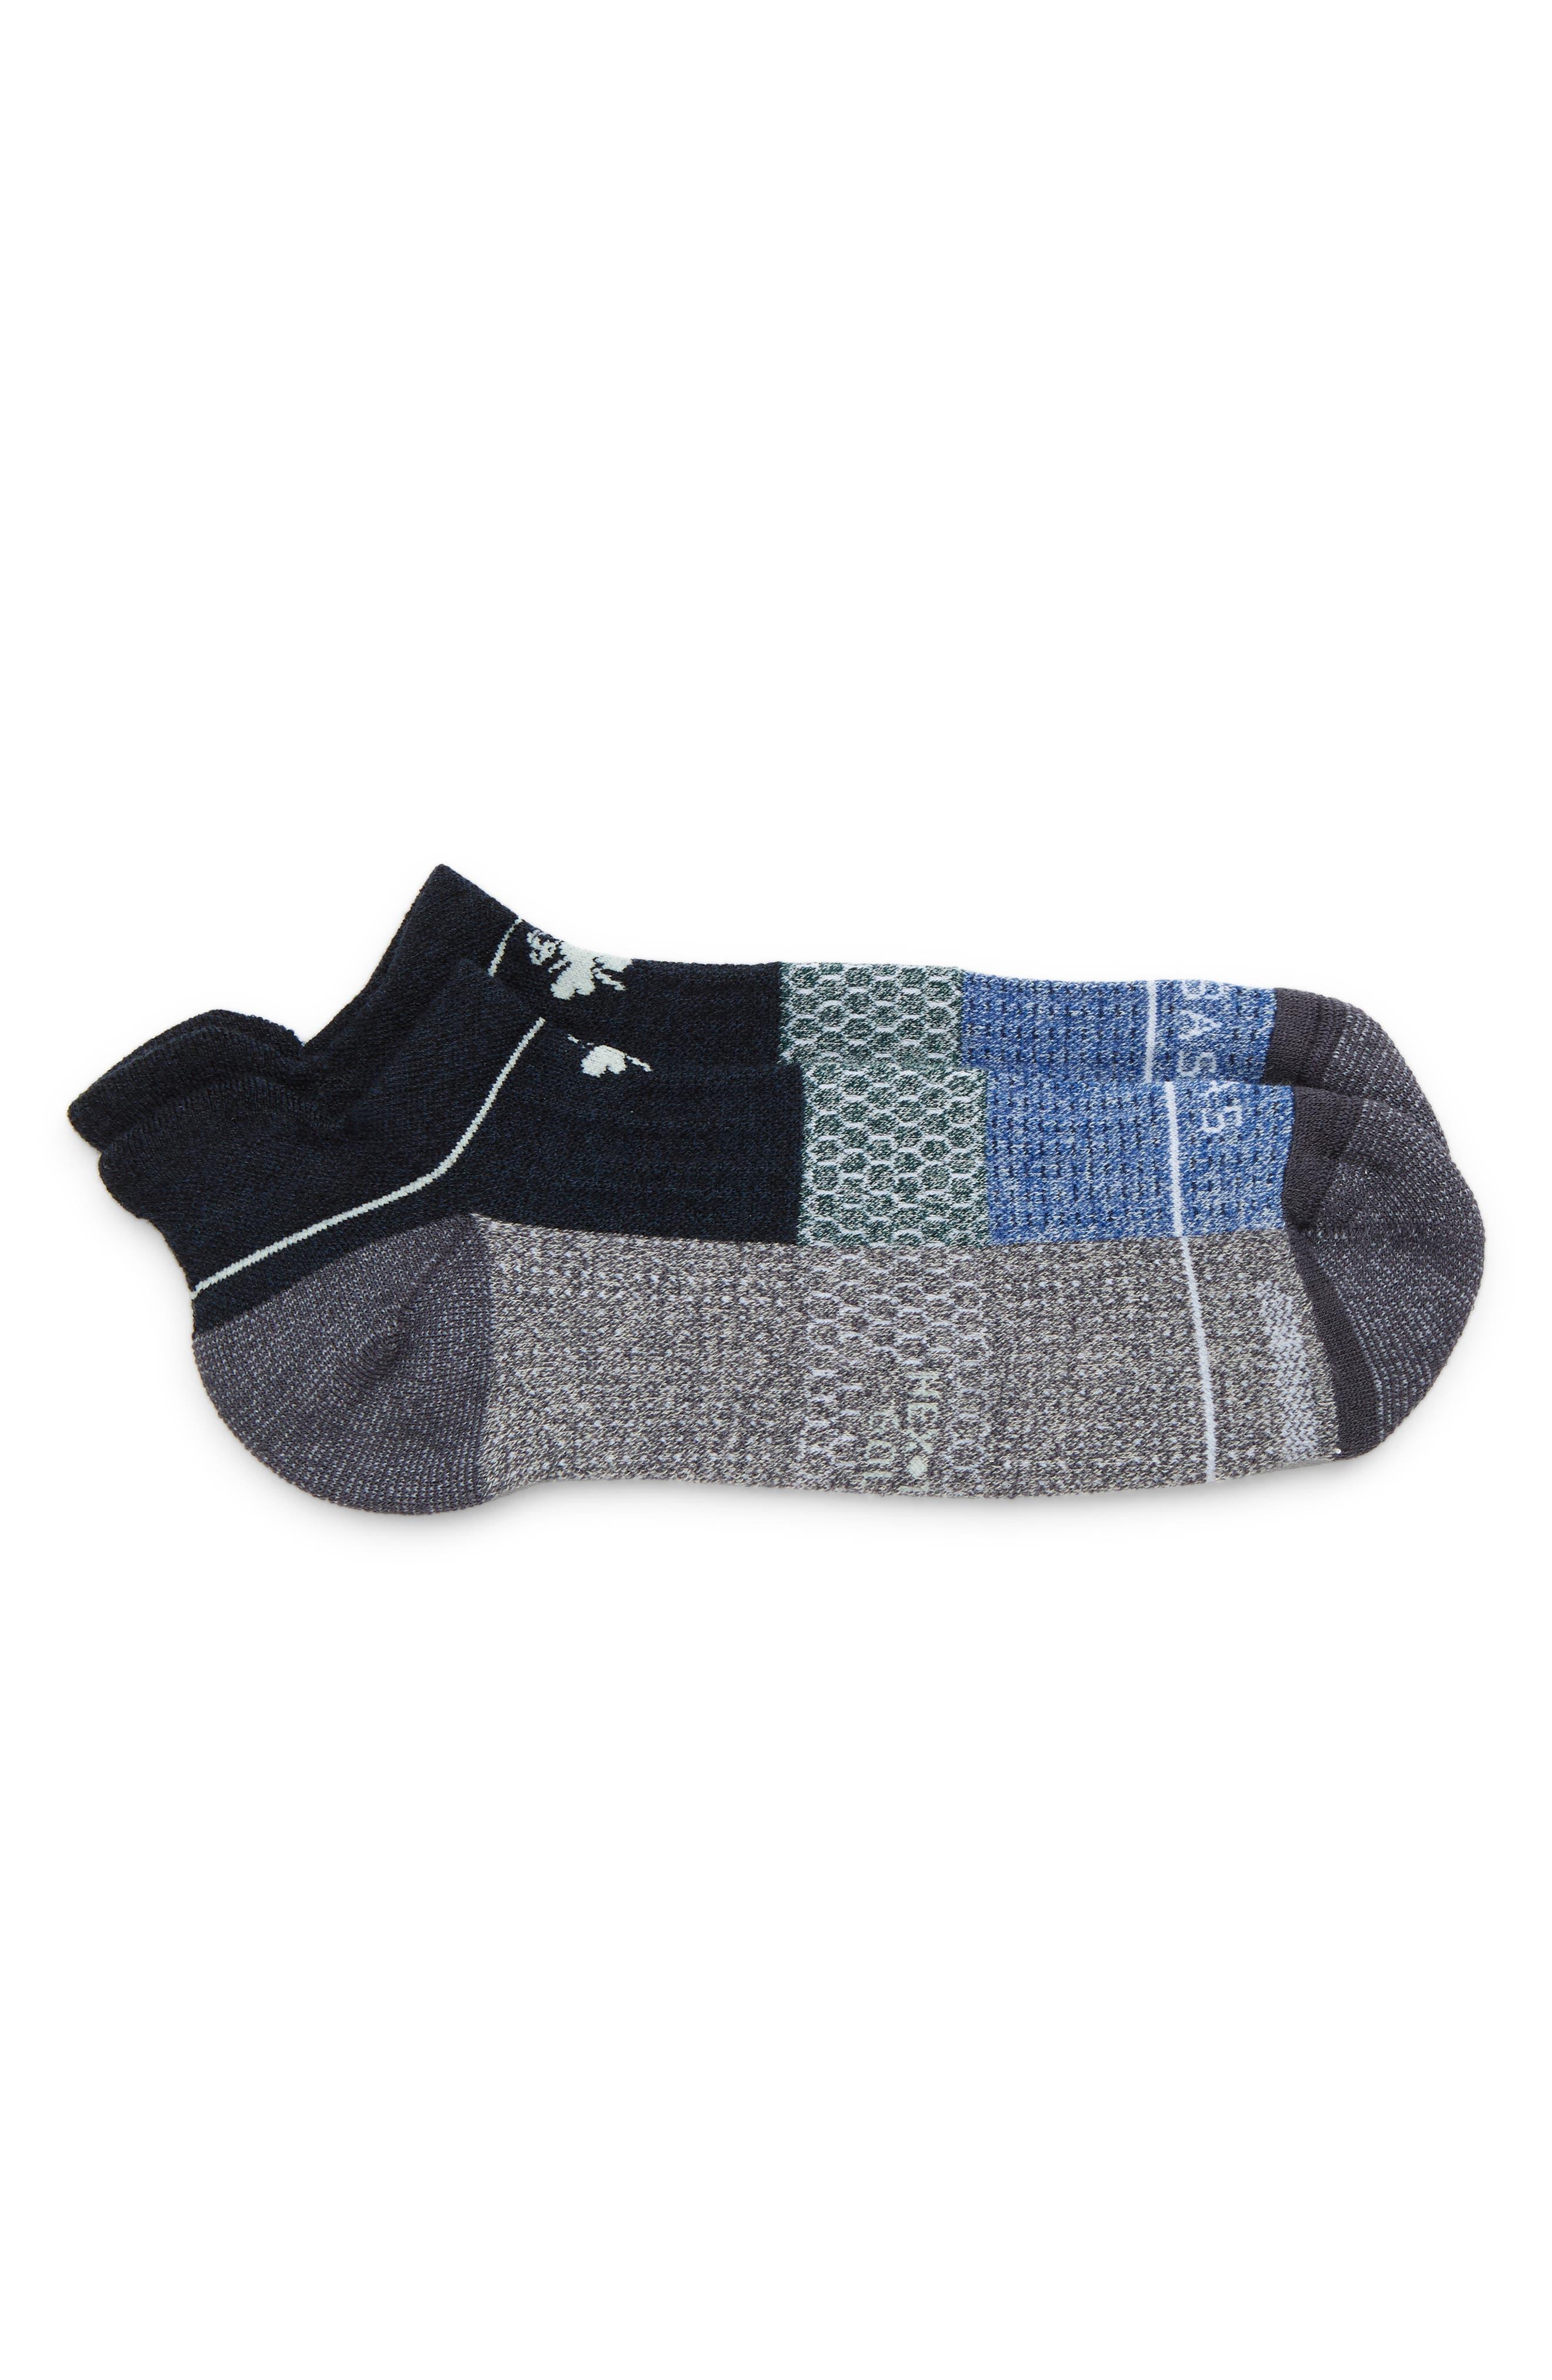 Performance Merino Wool Blend Golf Ankle Socks